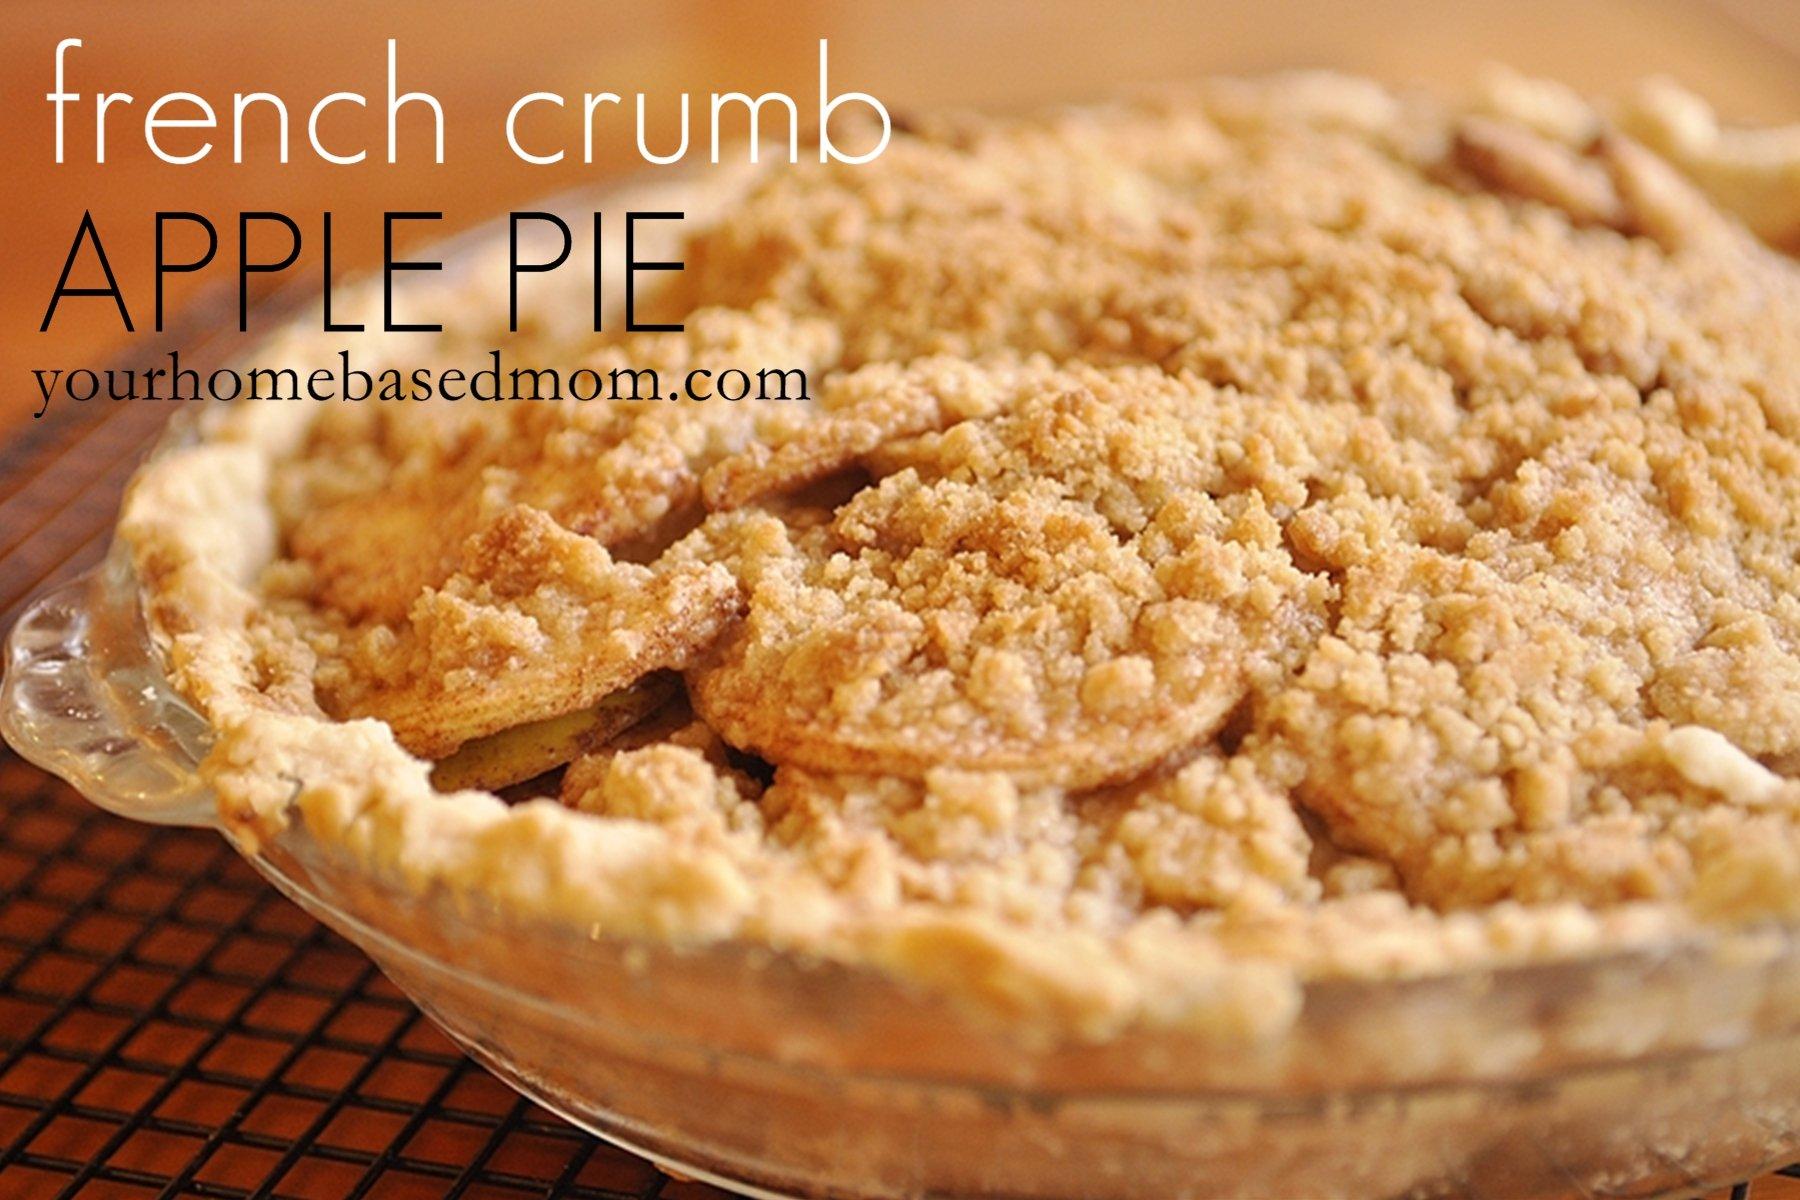 French Crumb Apple Pie